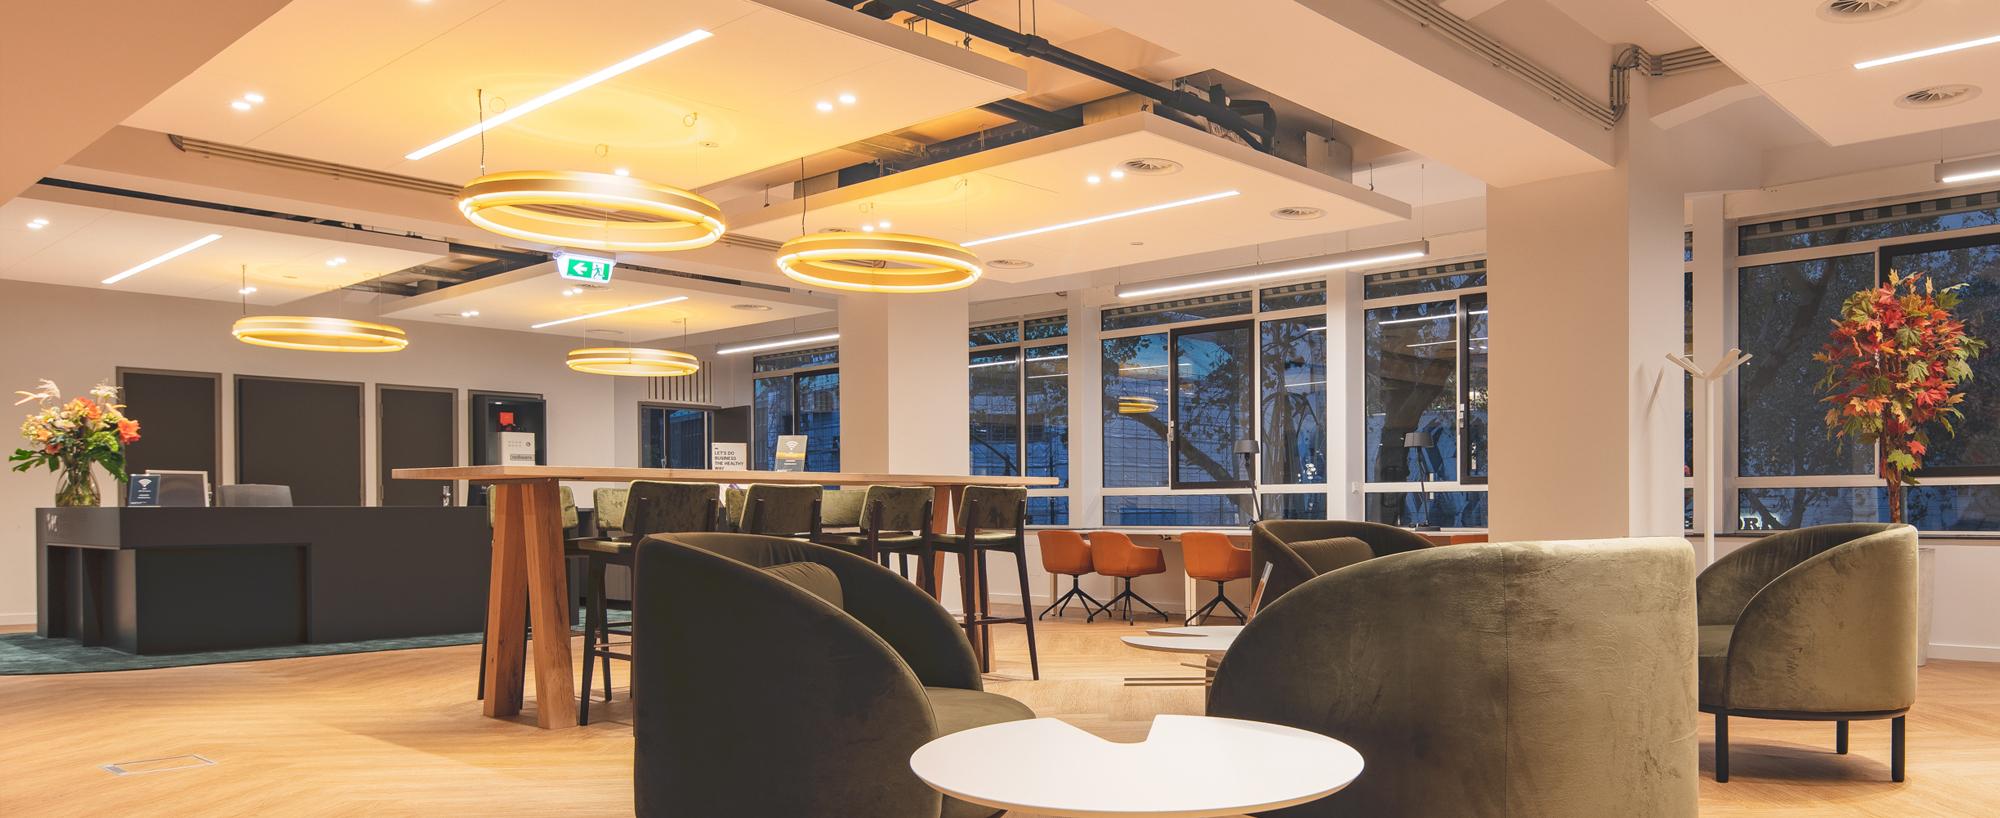 Renewed Business Center now open at World Trade Center Rotterdam